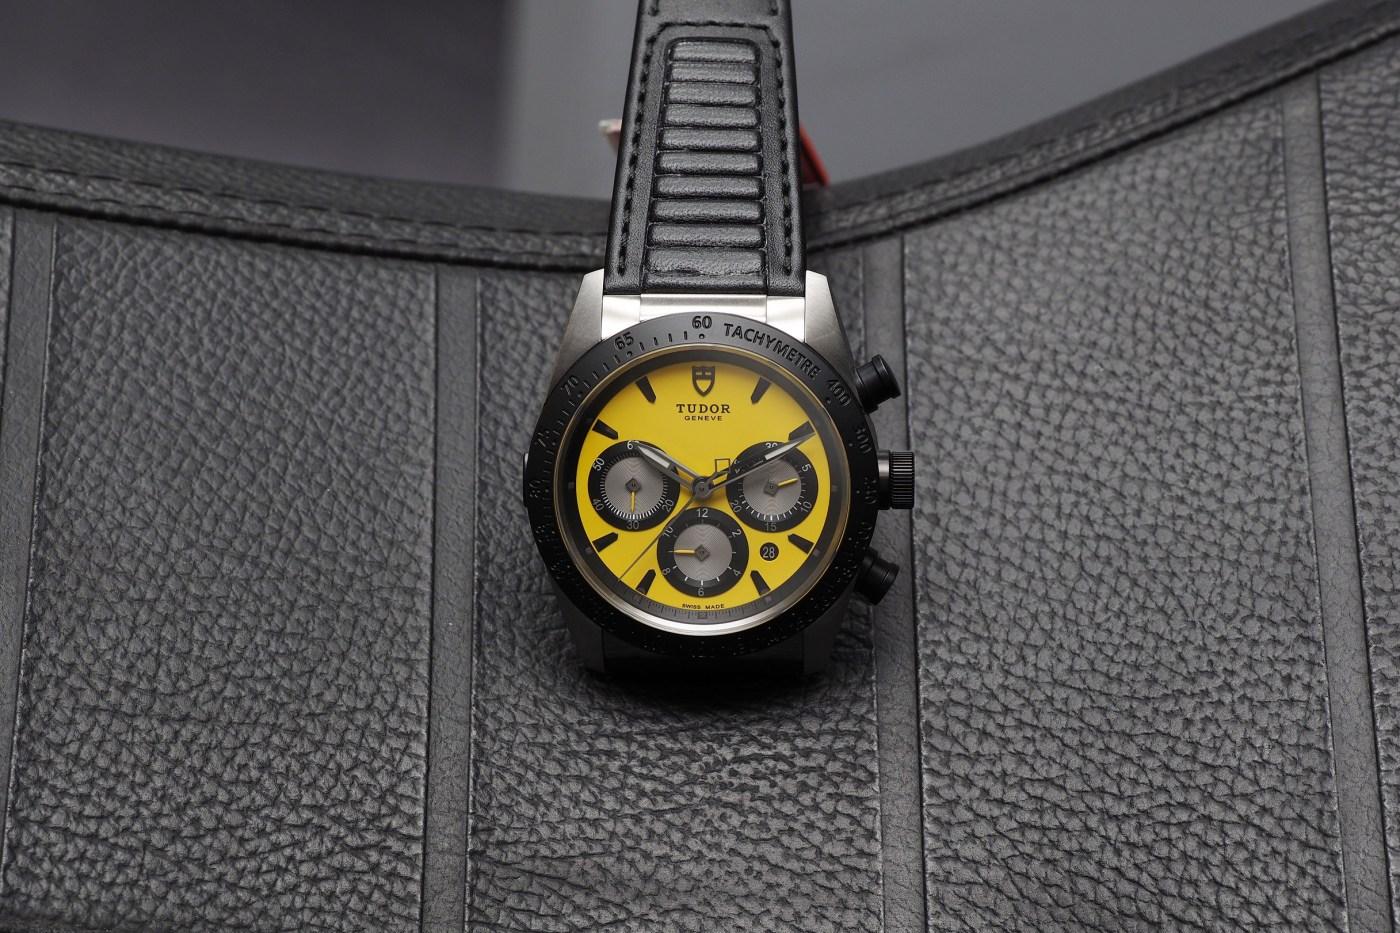 Tudor Ducati Yellow Chrono Fastrider